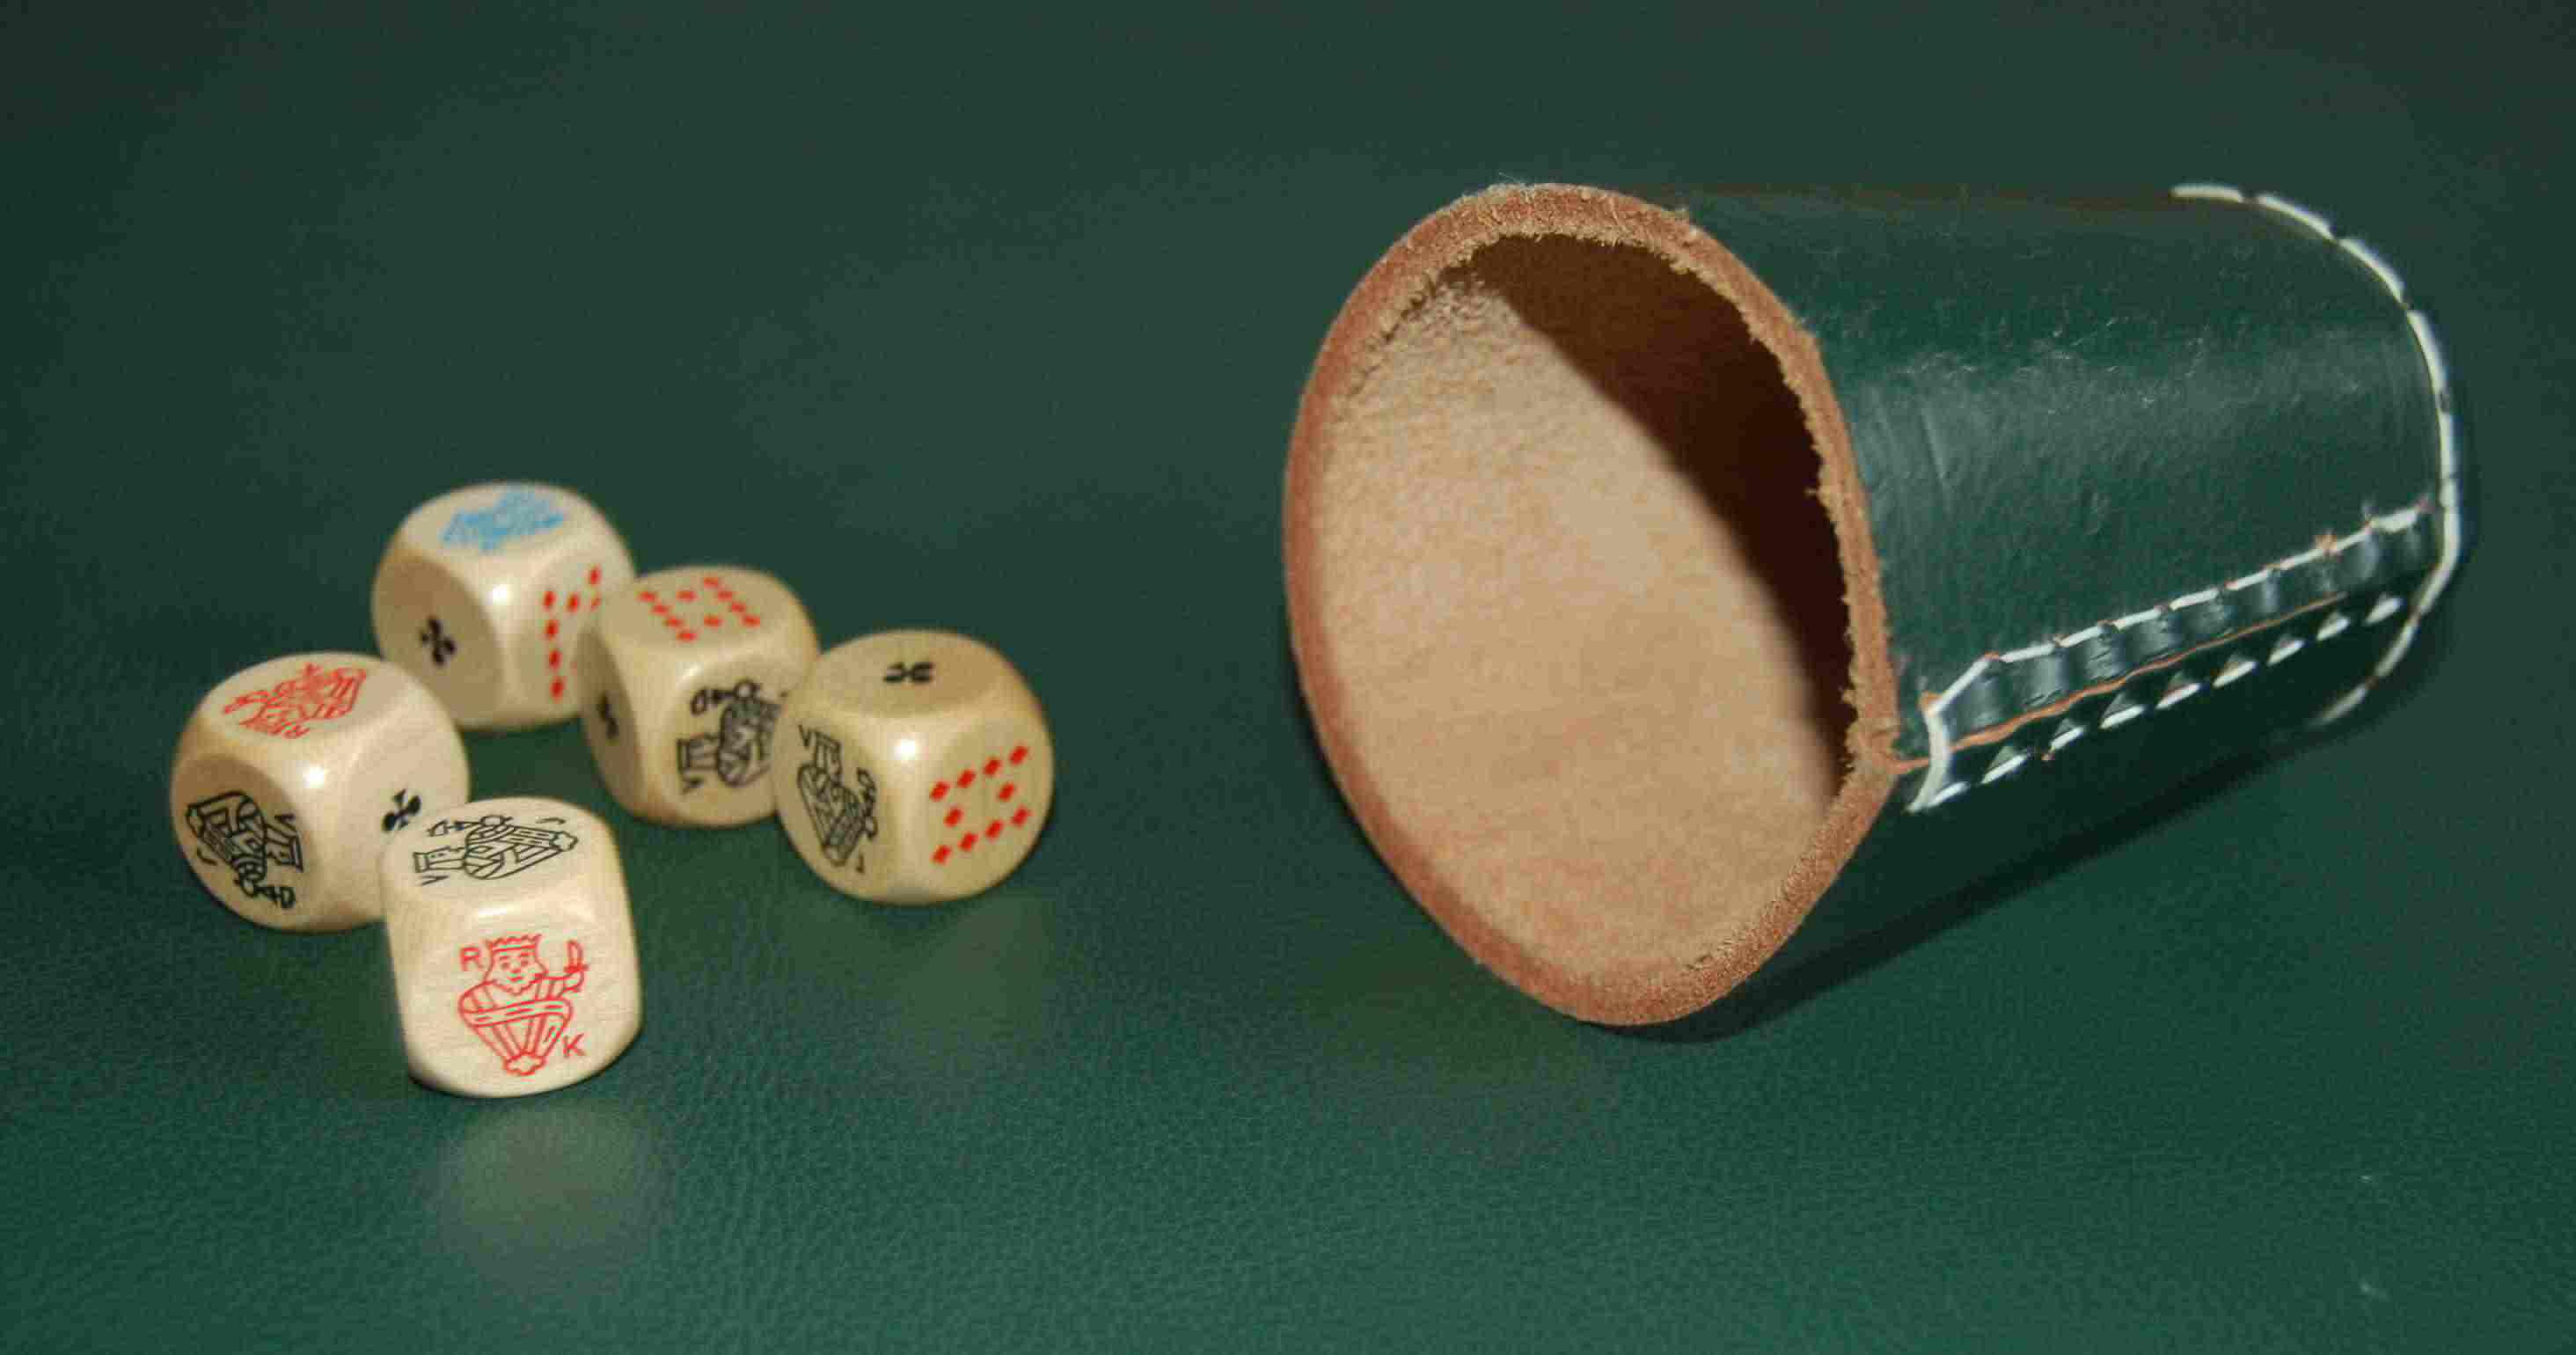 How to bet on poker dice taavura mining bitcoins